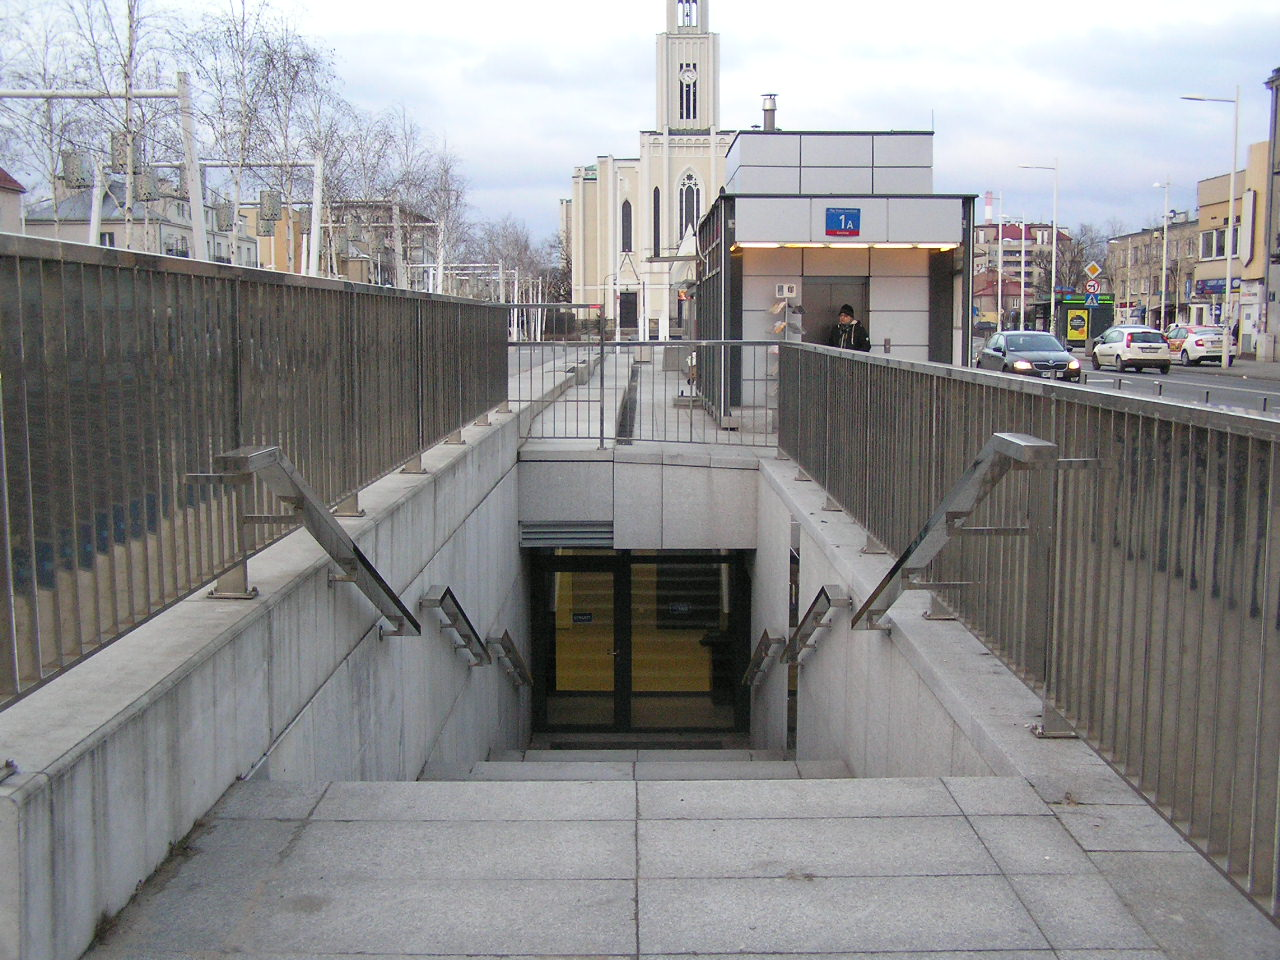 Toaleta na Placu Szembeka w końcu otwarta